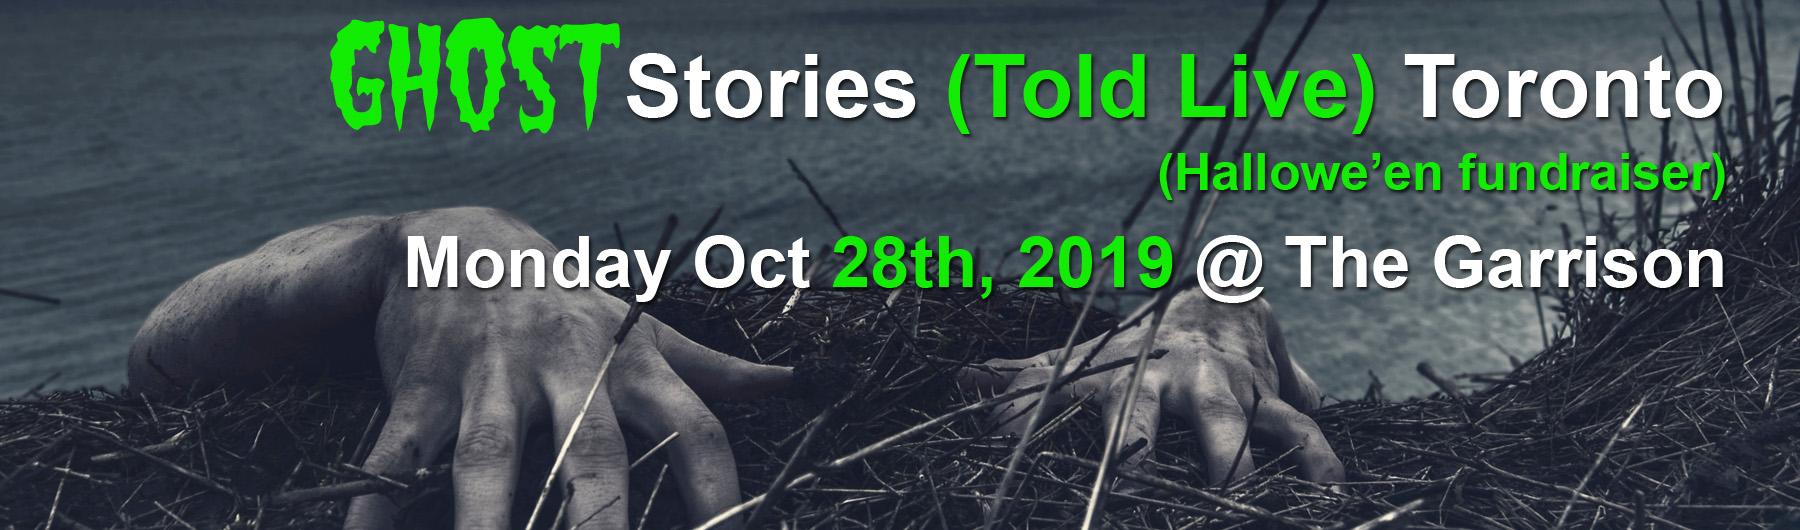 Ghost Stories Toronto 2019